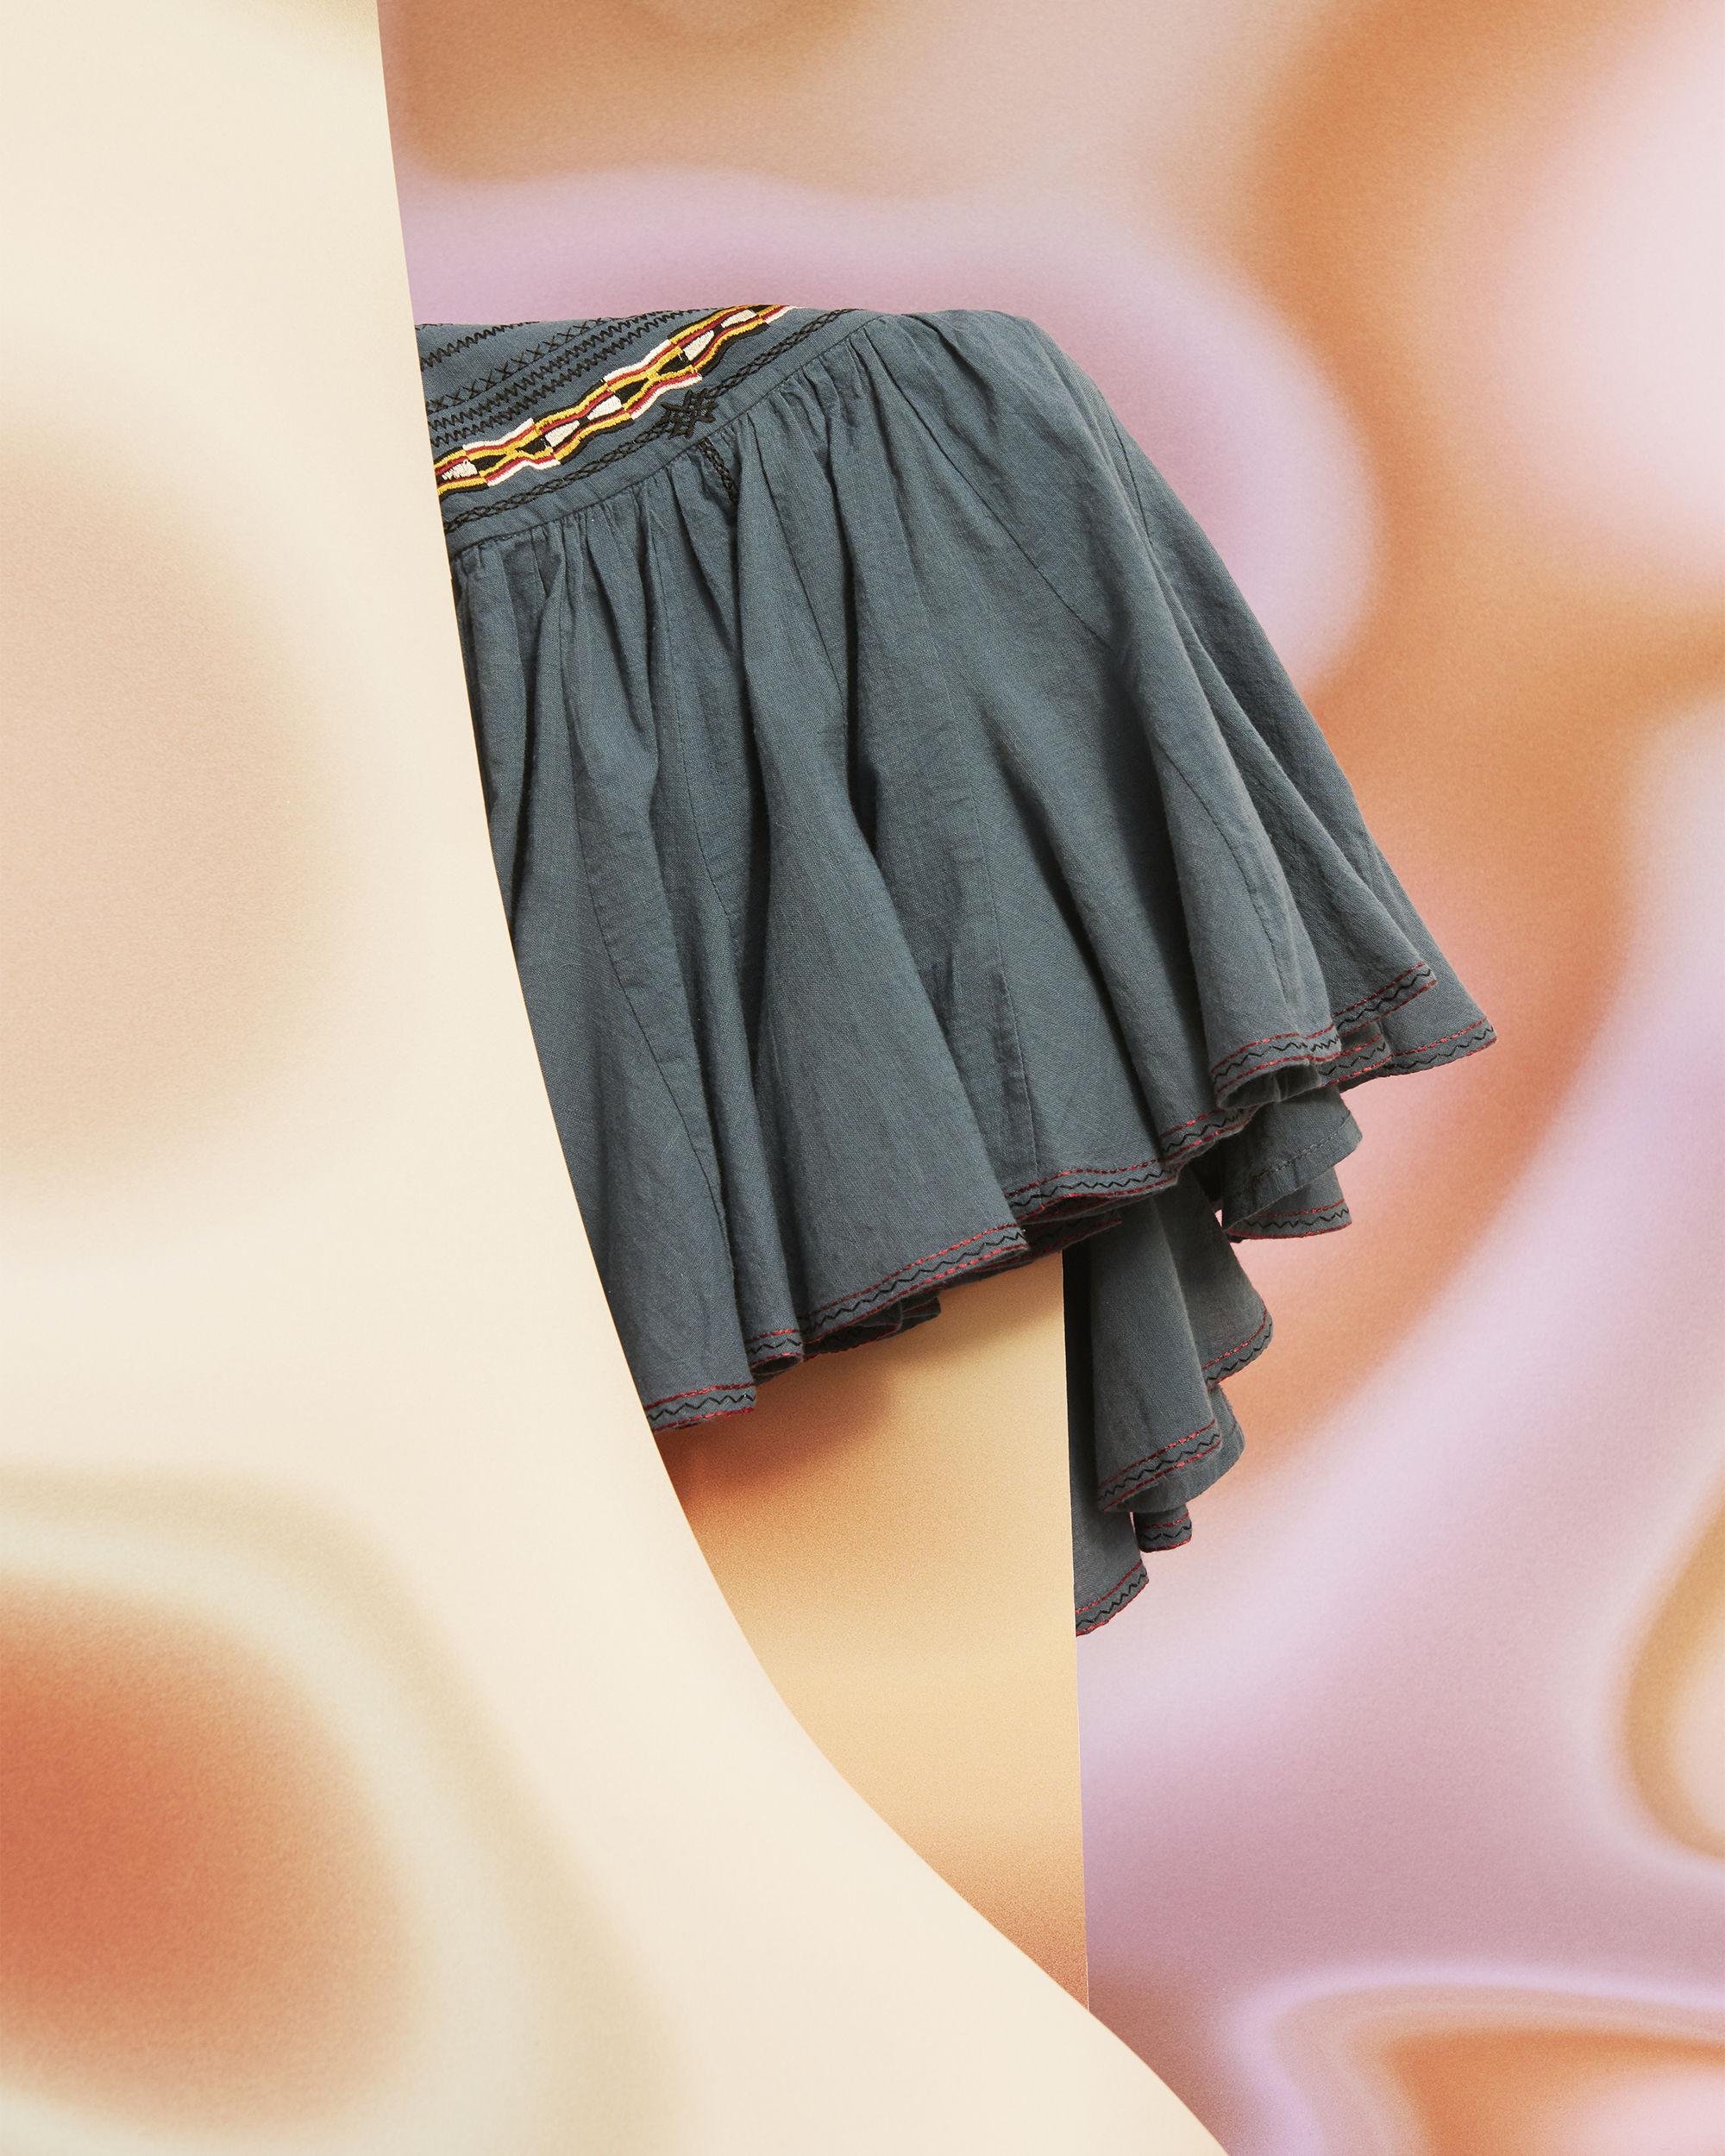 BREEDA embroidered skirt